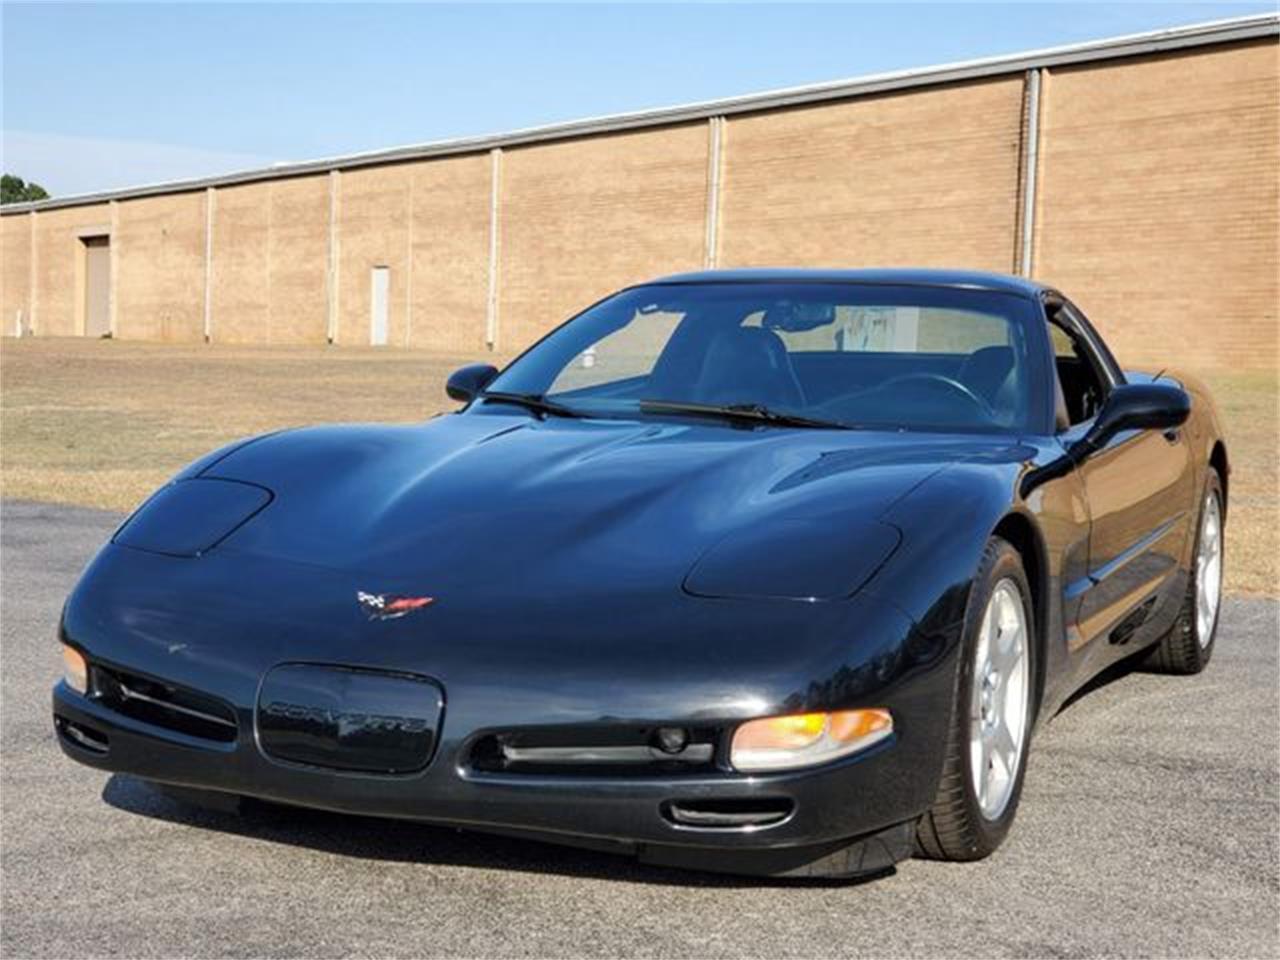 1997 Chevrolet Corvette (CC-1321044) for sale in Hope Mills, North Carolina